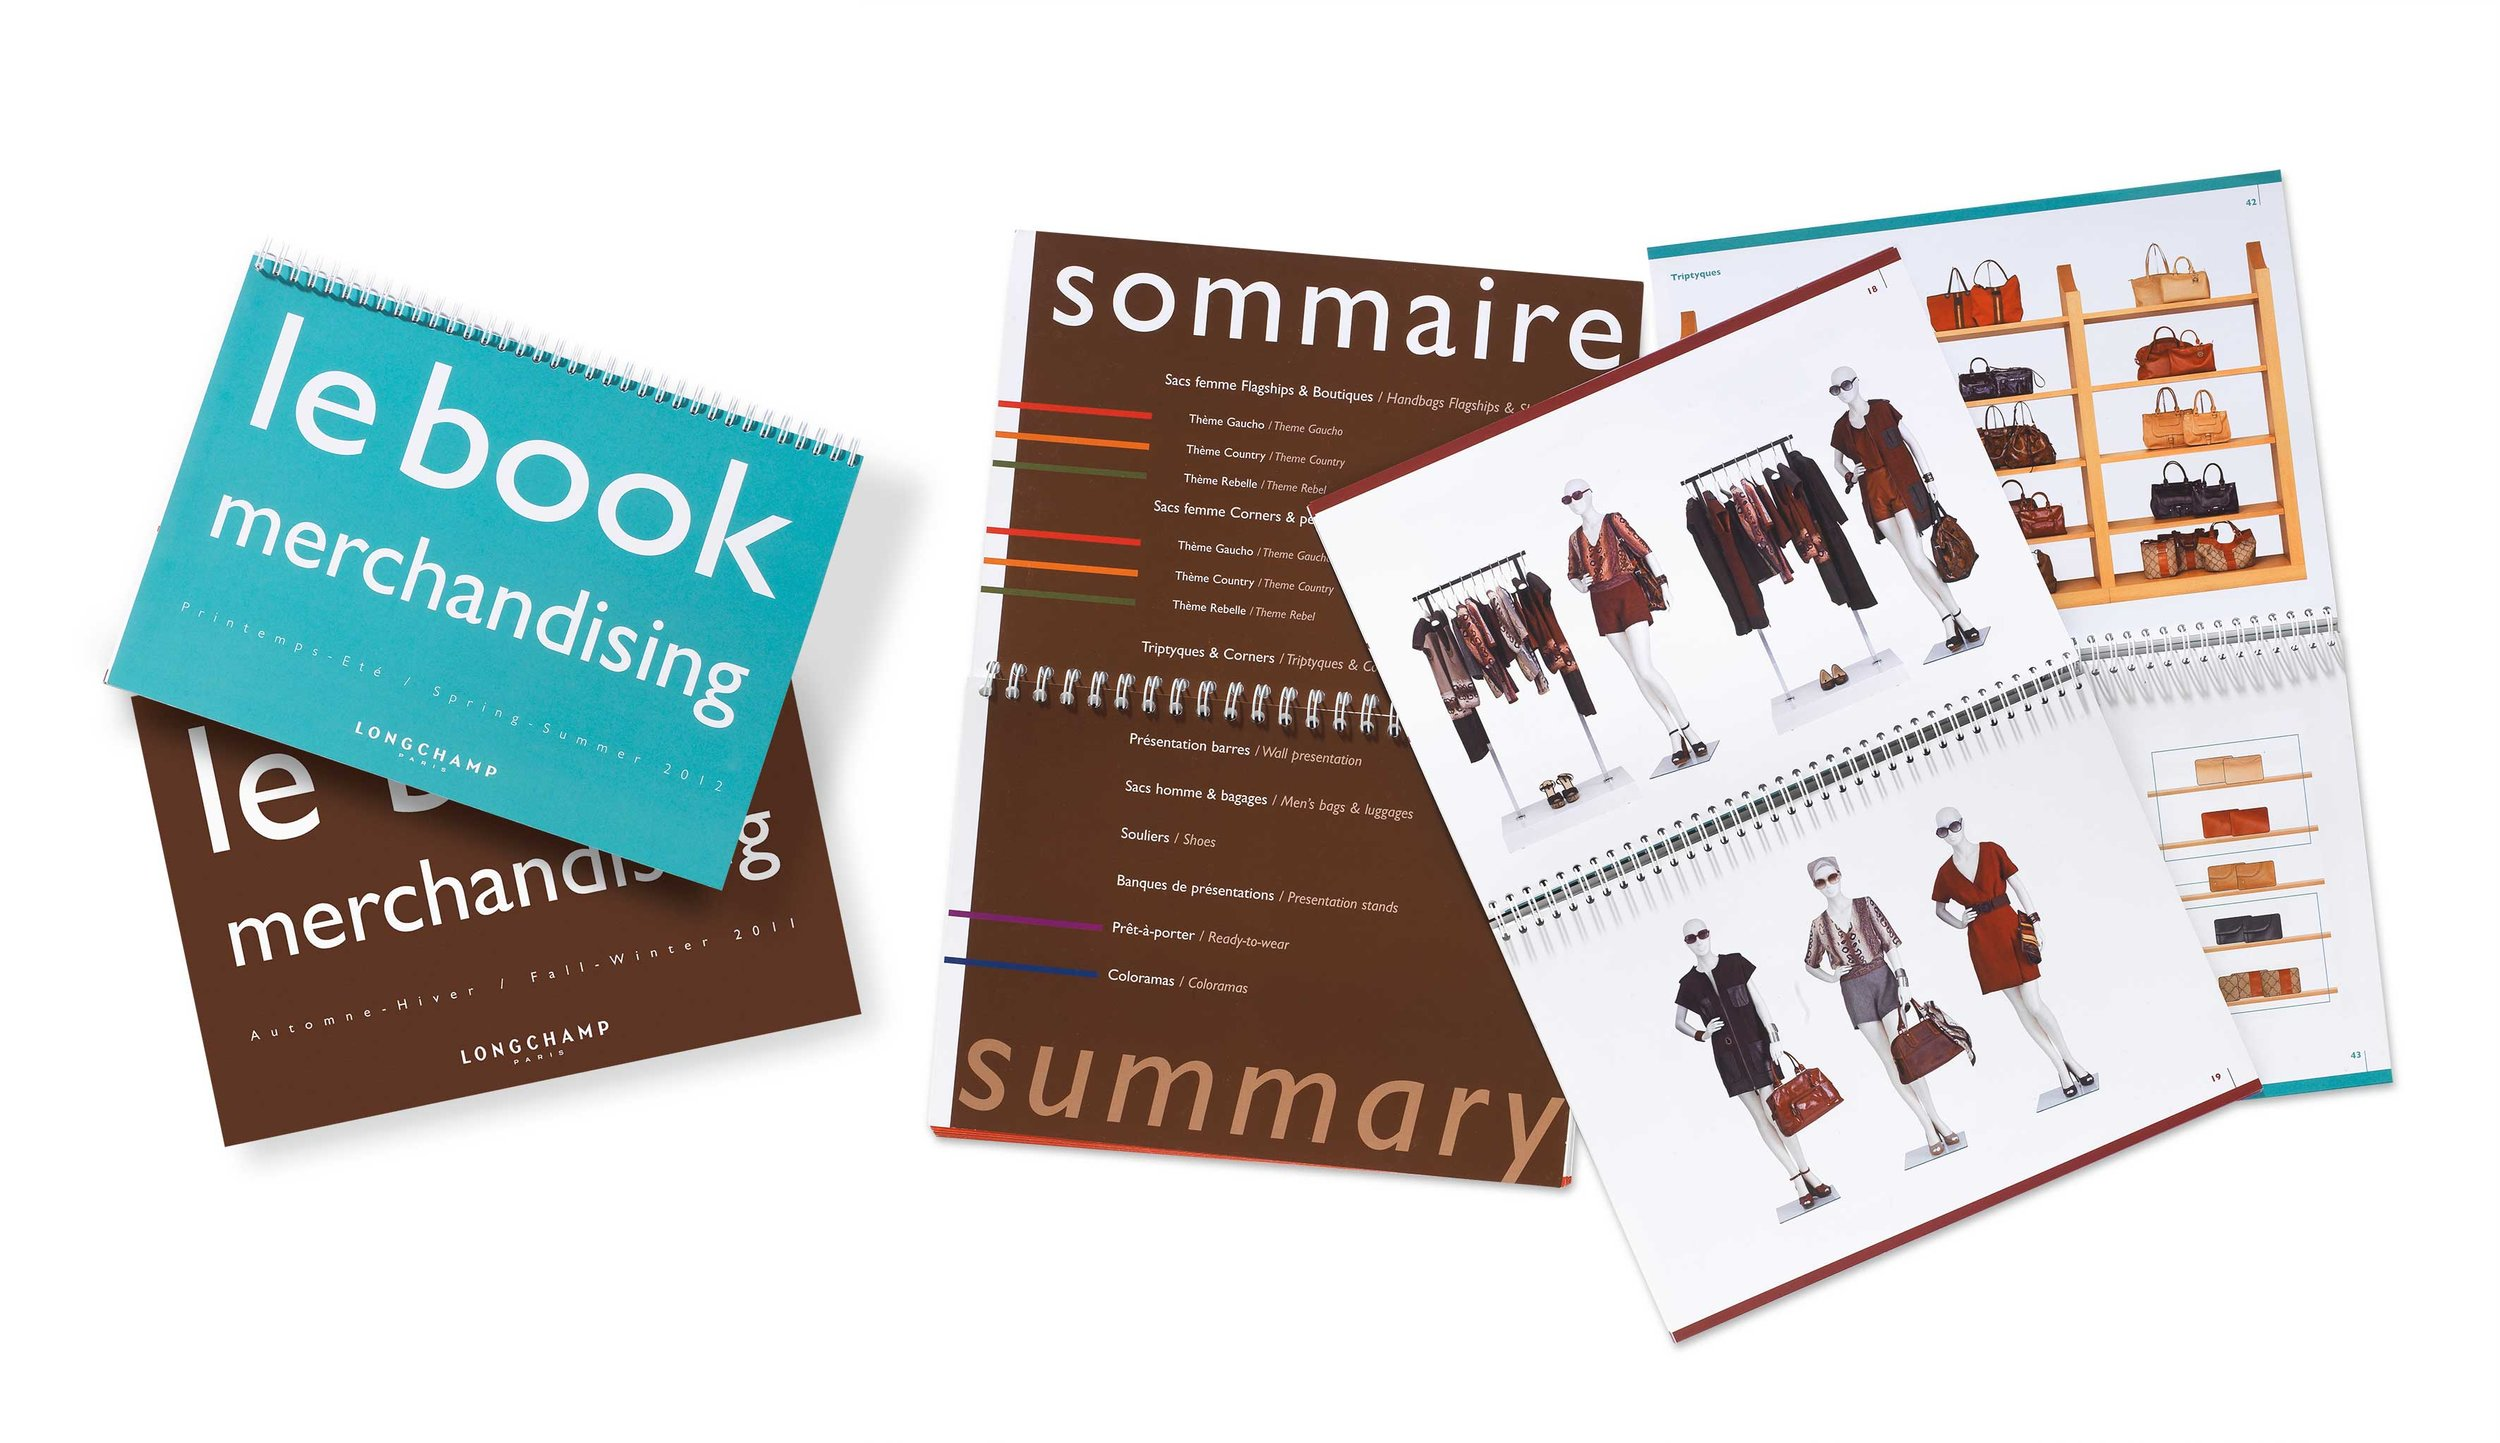 book_merch_Longchamp.jpg